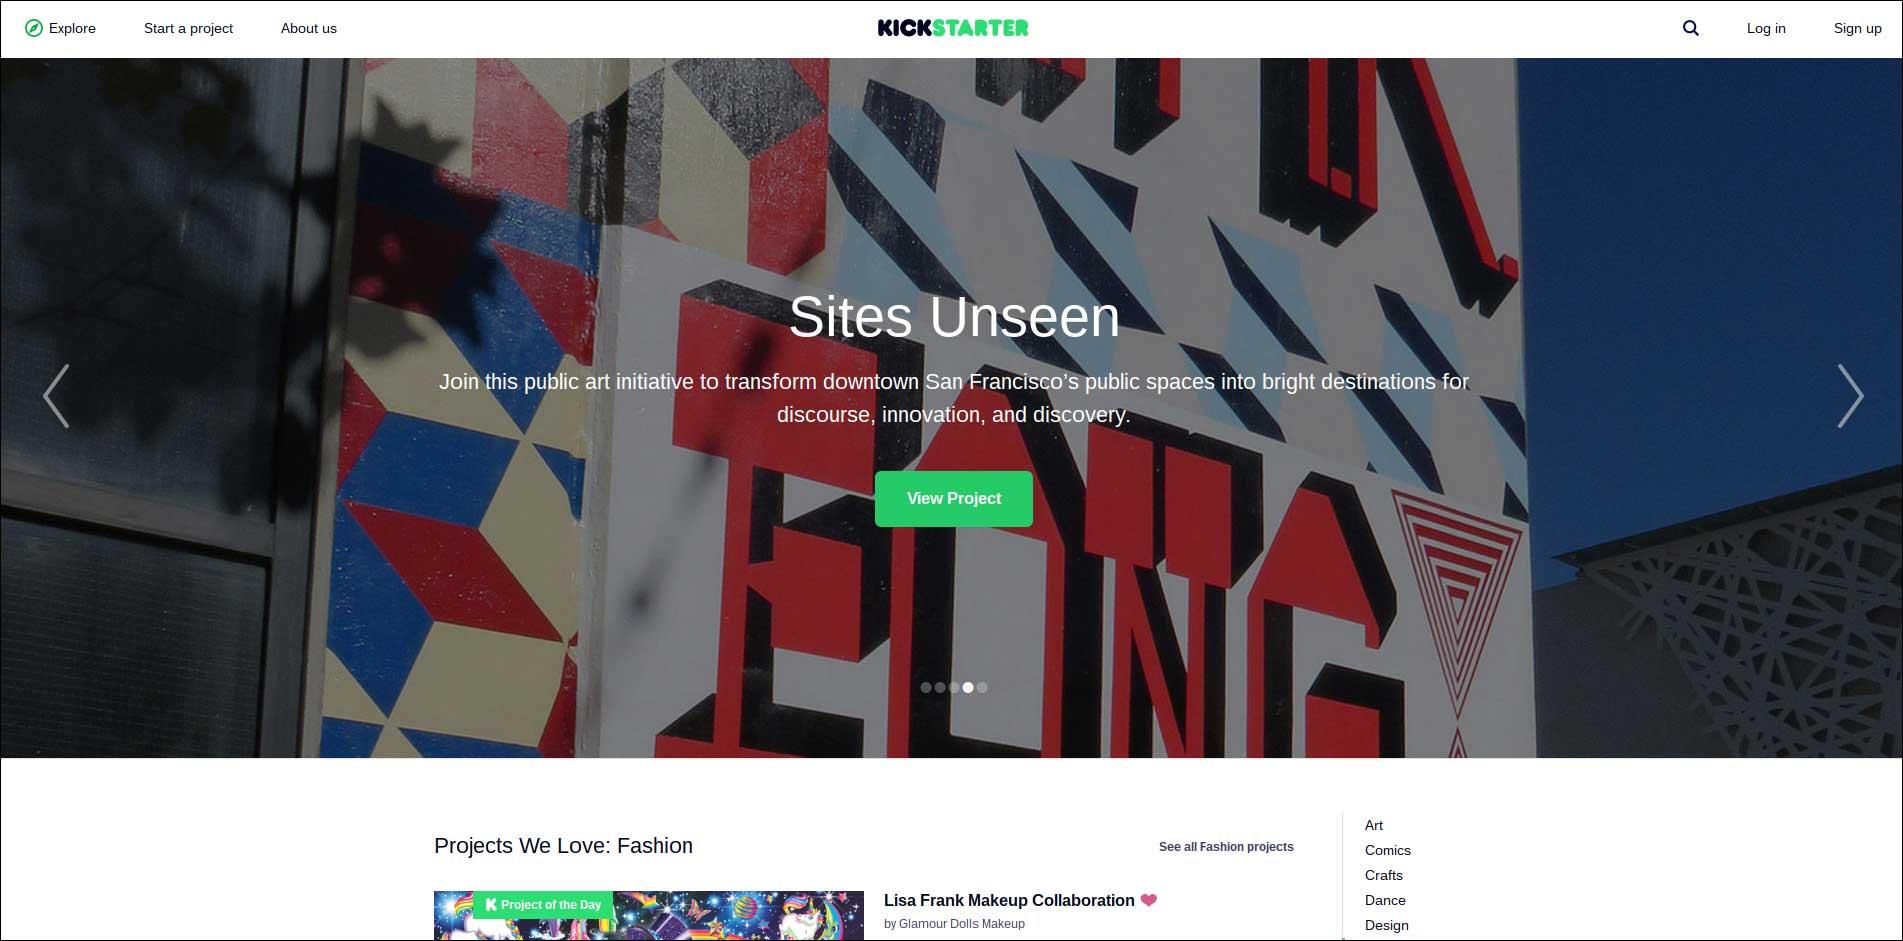 Accept online donations with Kickstarter